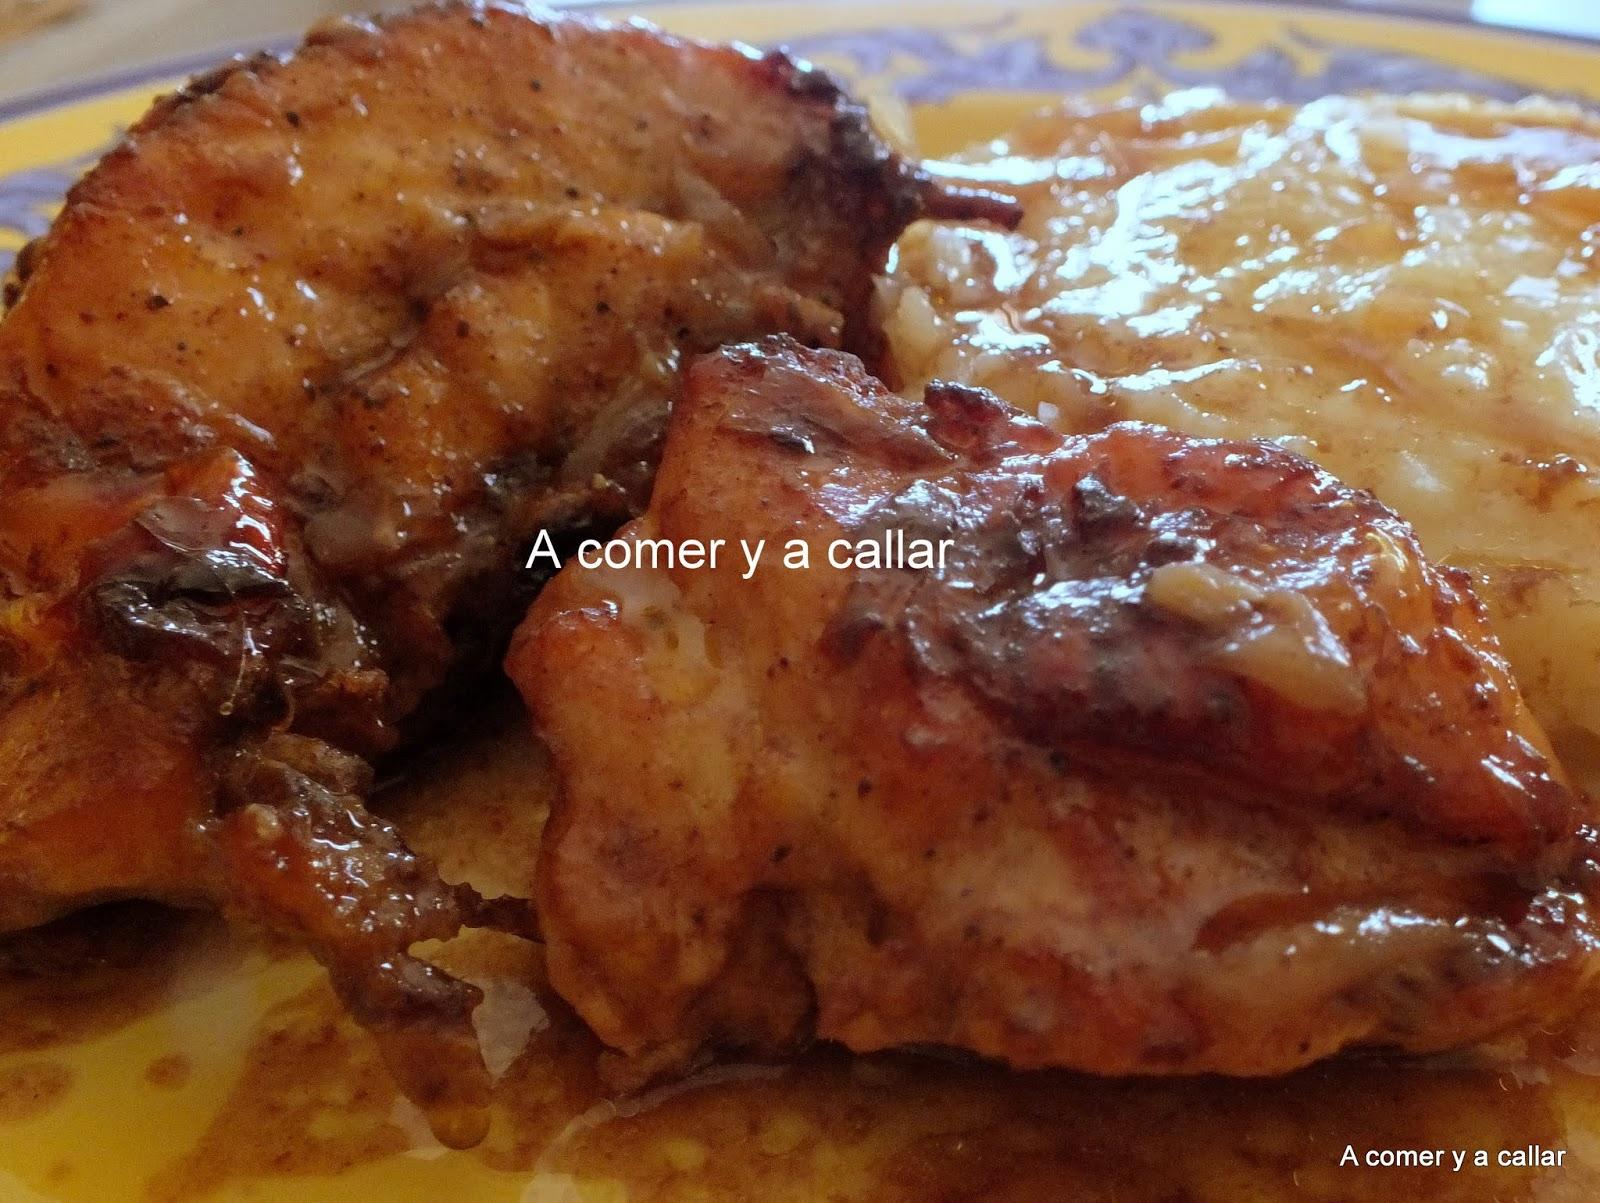 A comer y a callar: POLLO ASADO CON COCACOLA